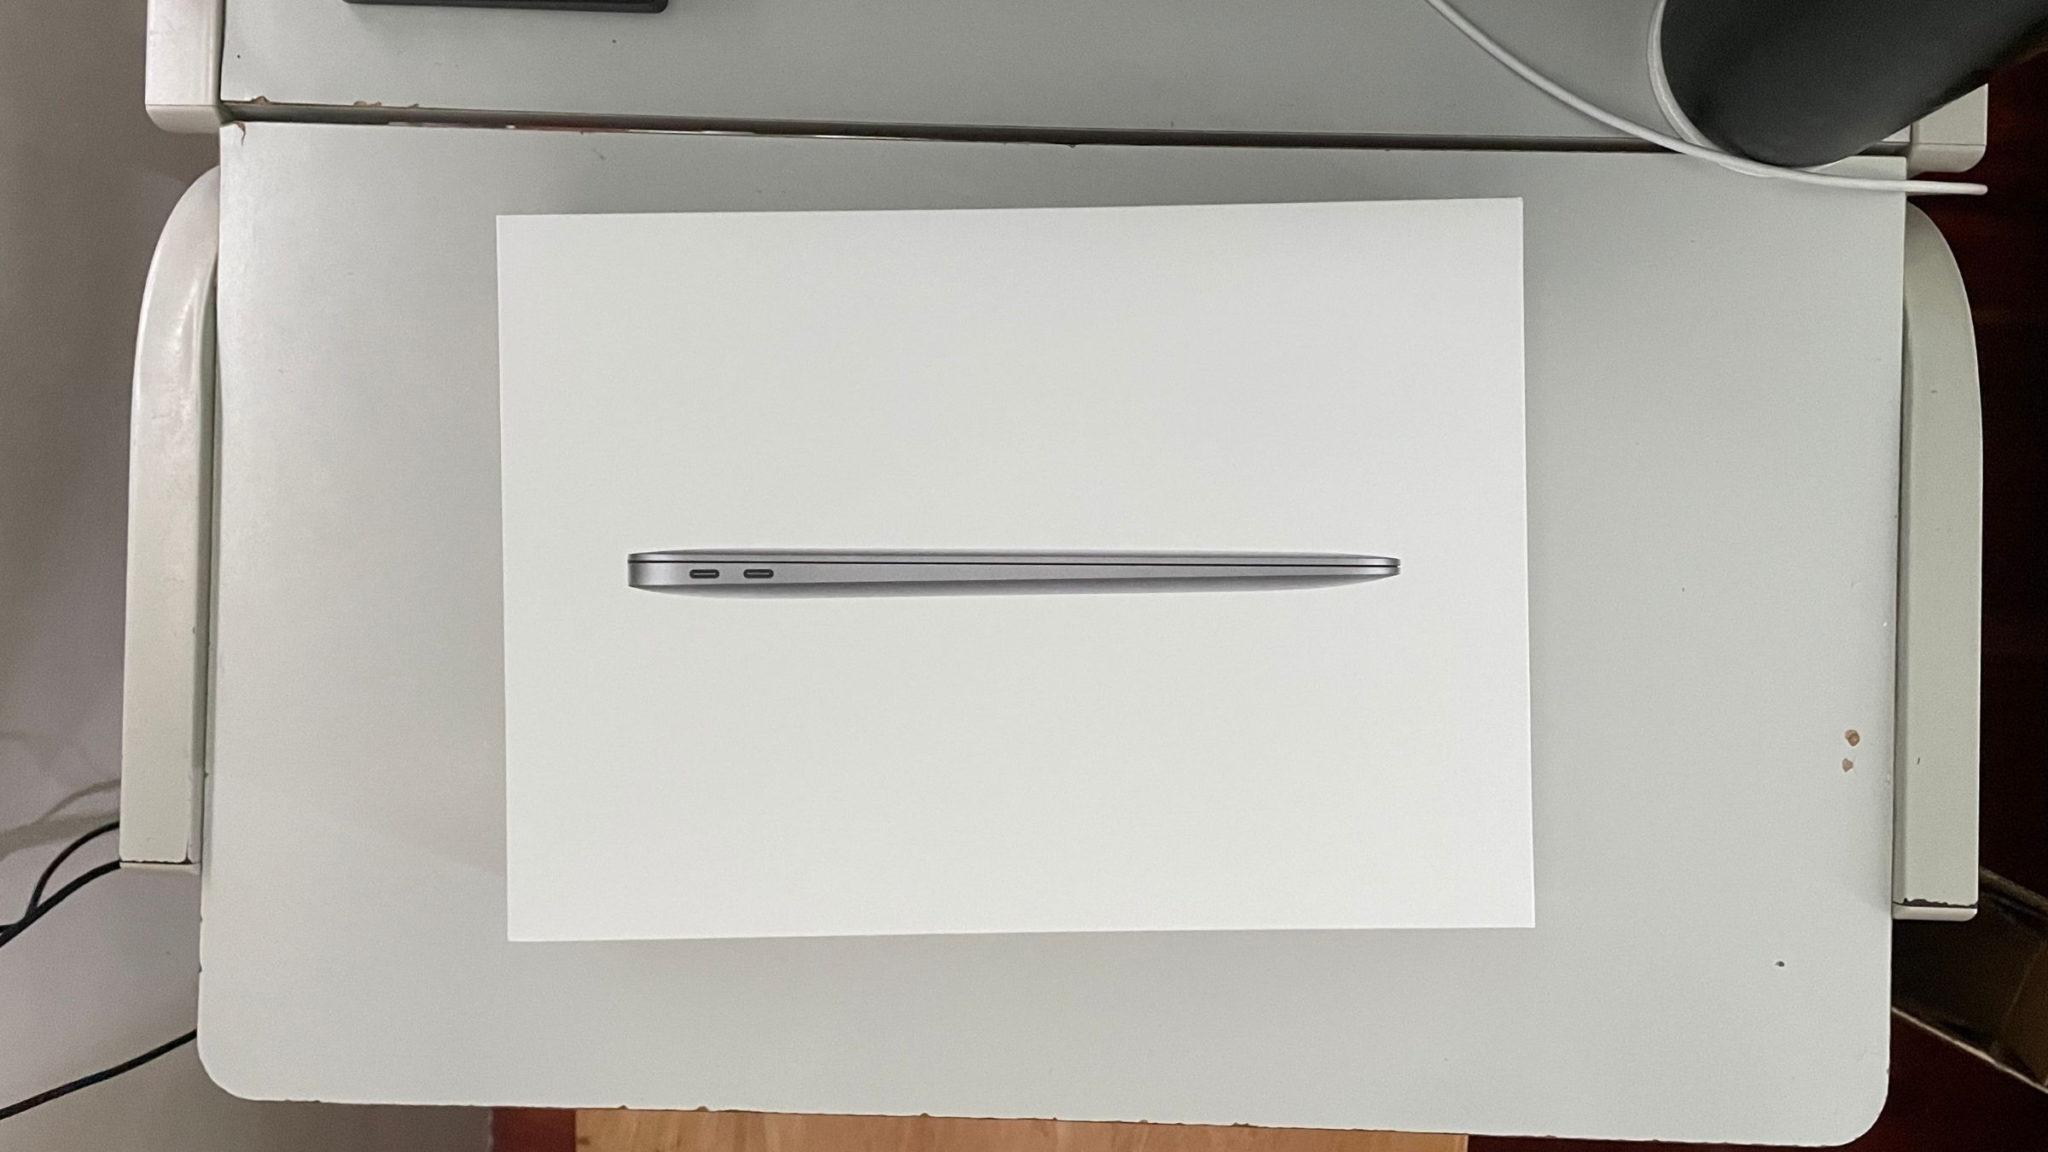 MacBook Air M1 First Impressions Header